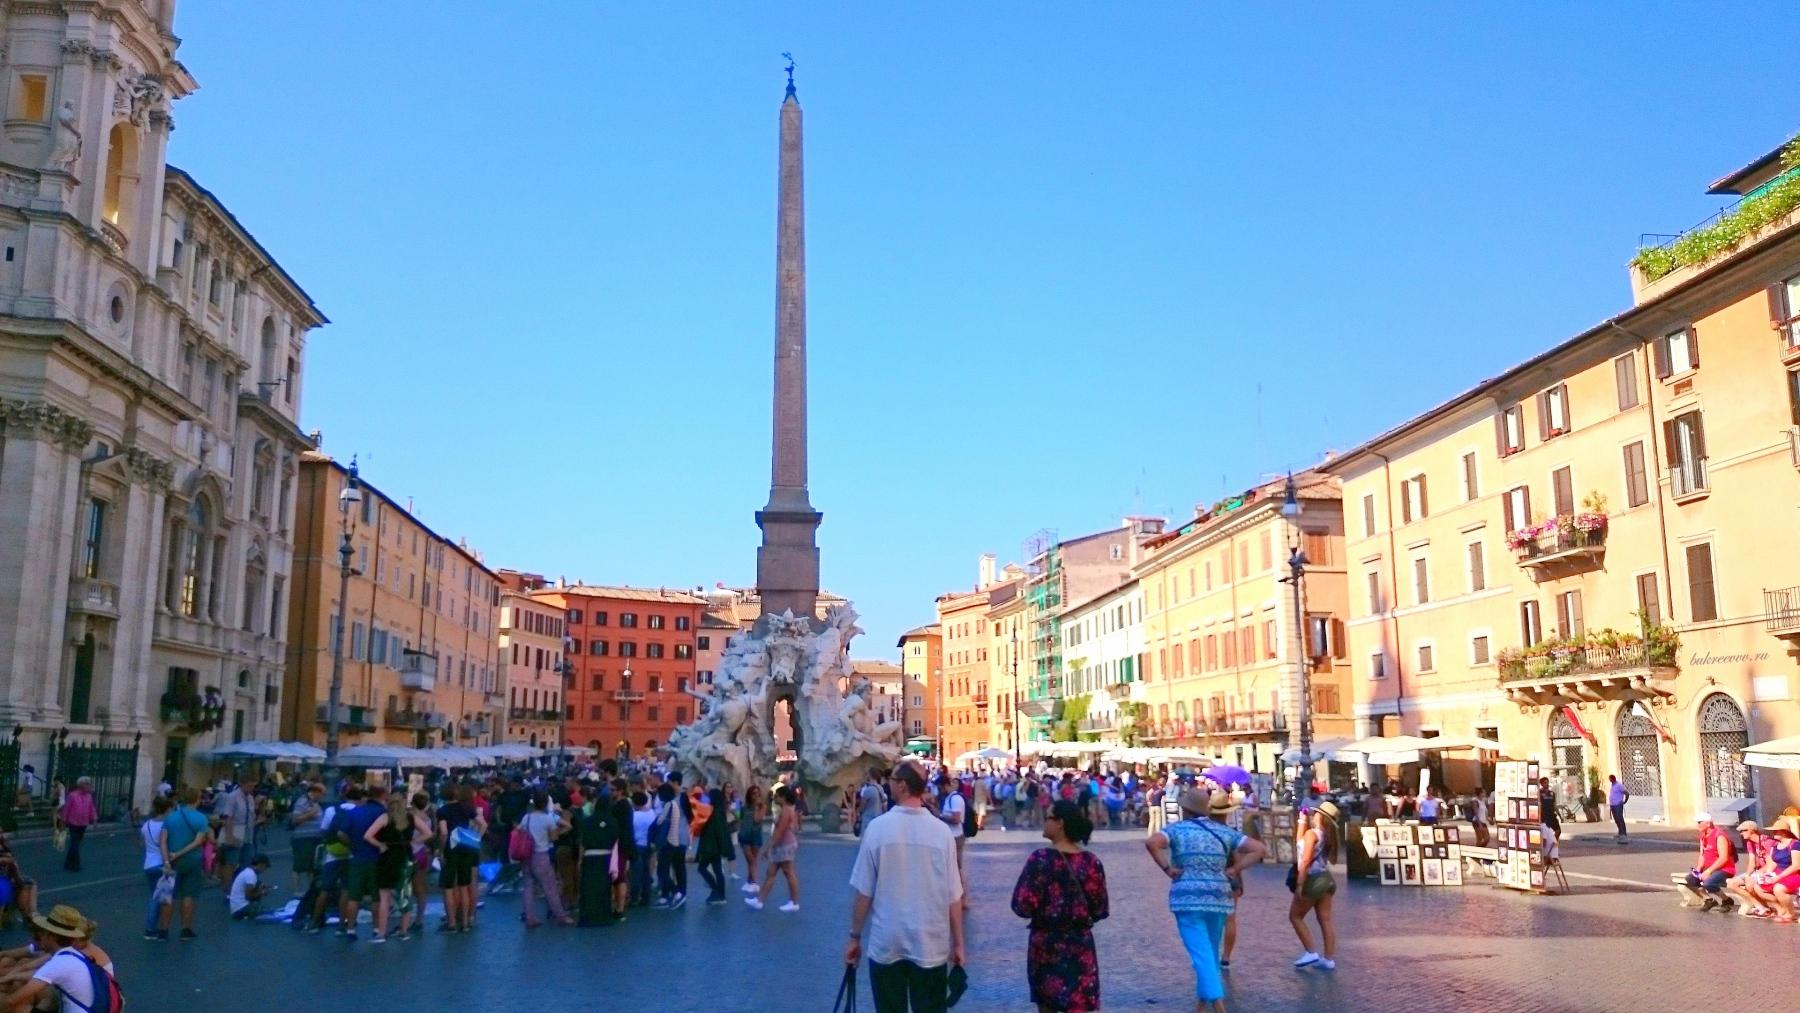 Piazza Navona 58